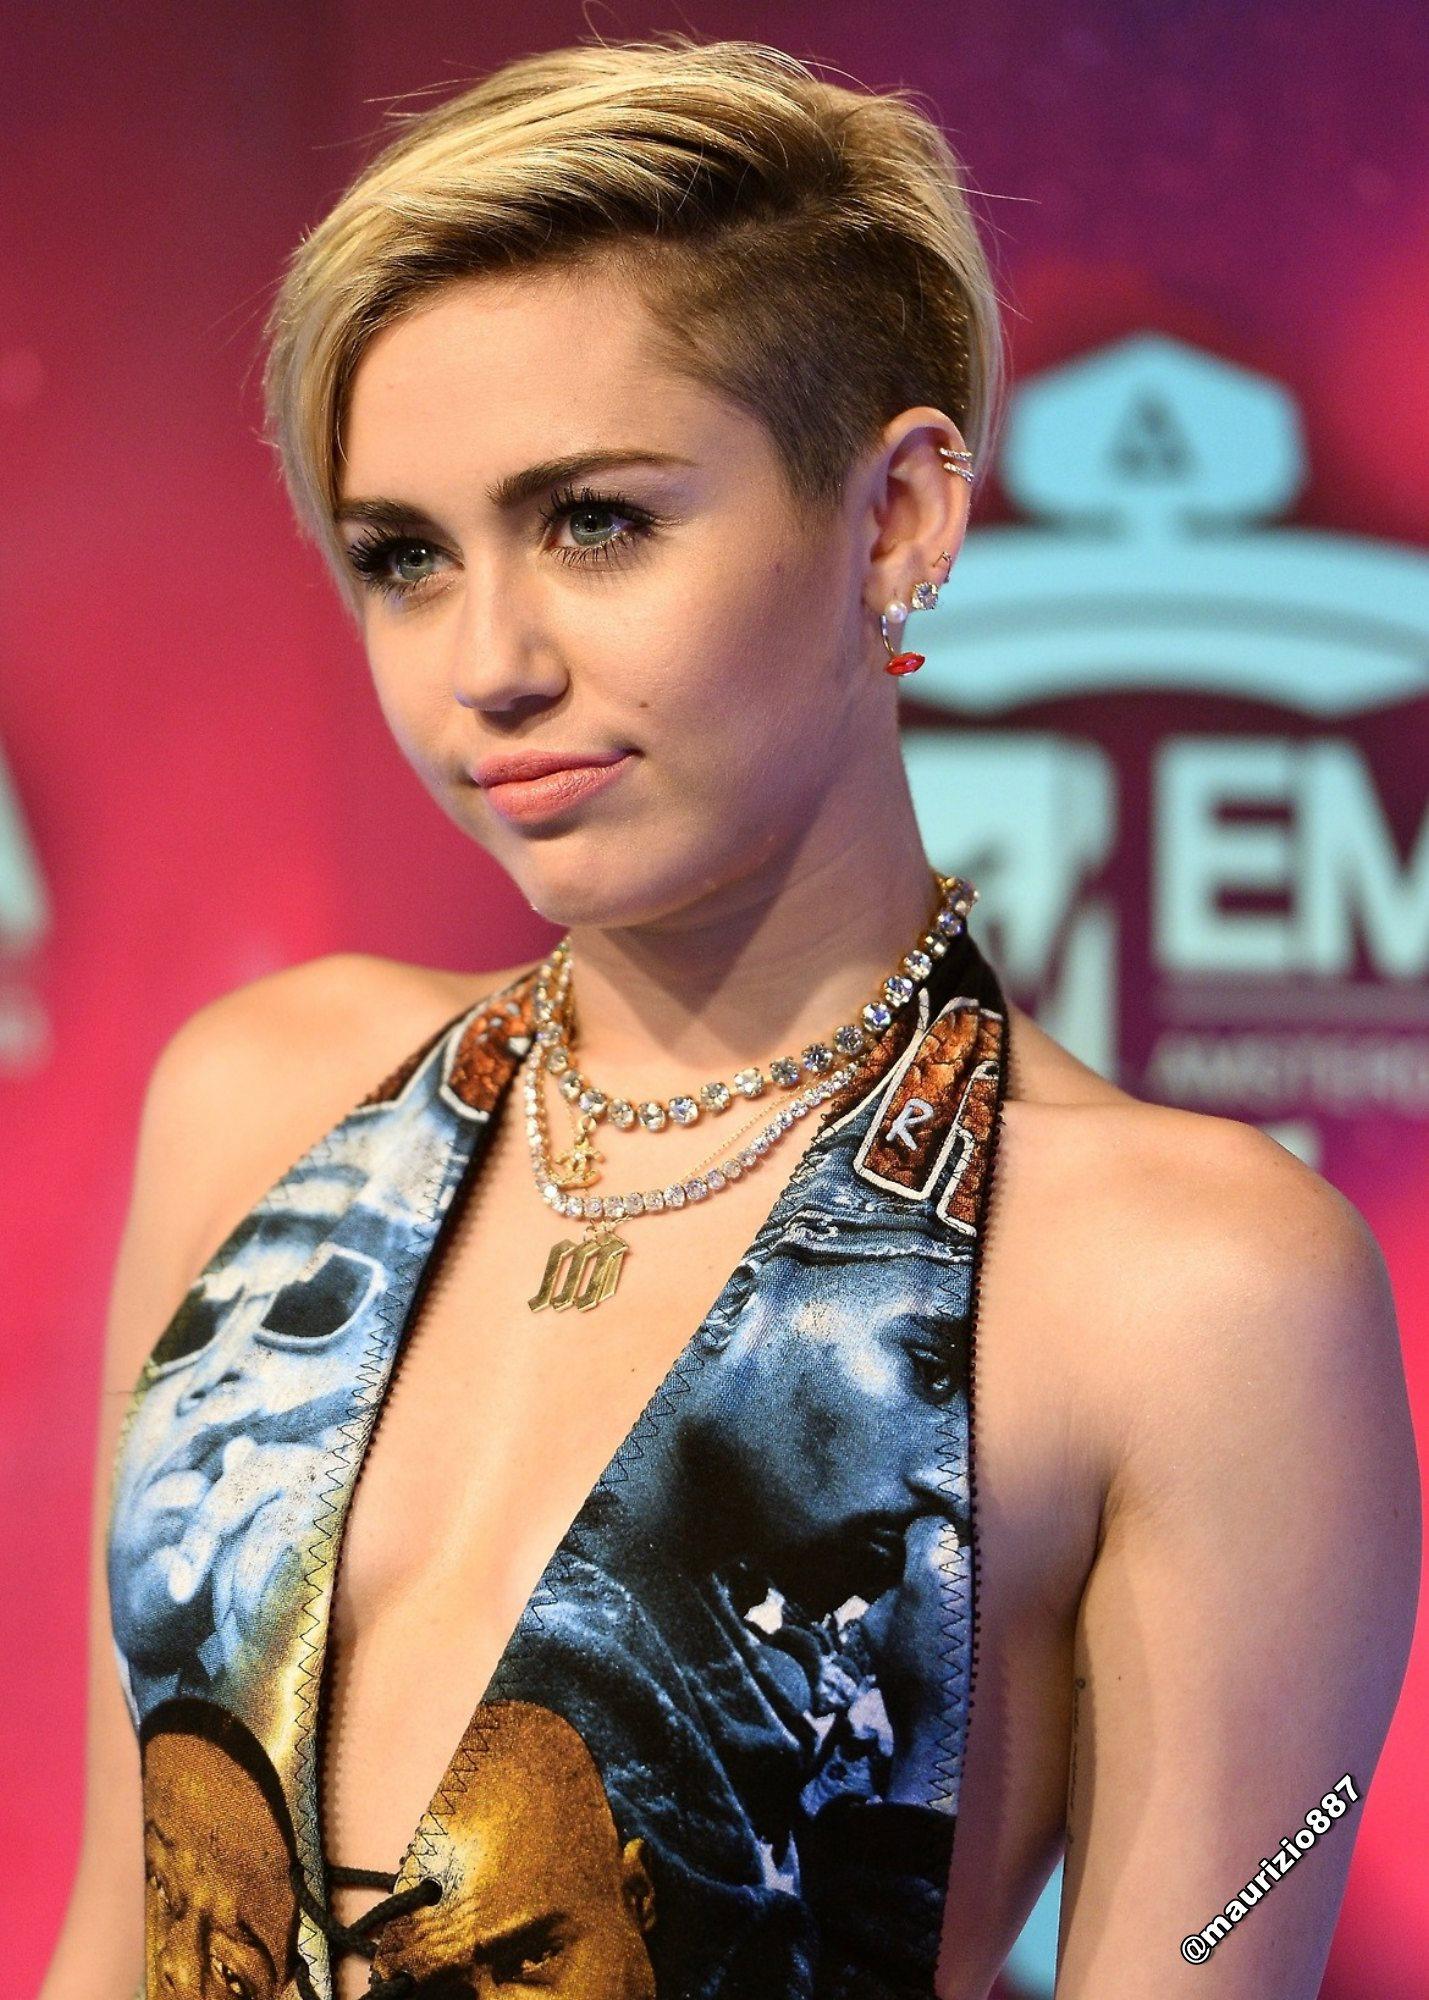 Miley Cyrus images Miley Cyrus MTV EMA 2013 HD wallpaper ...